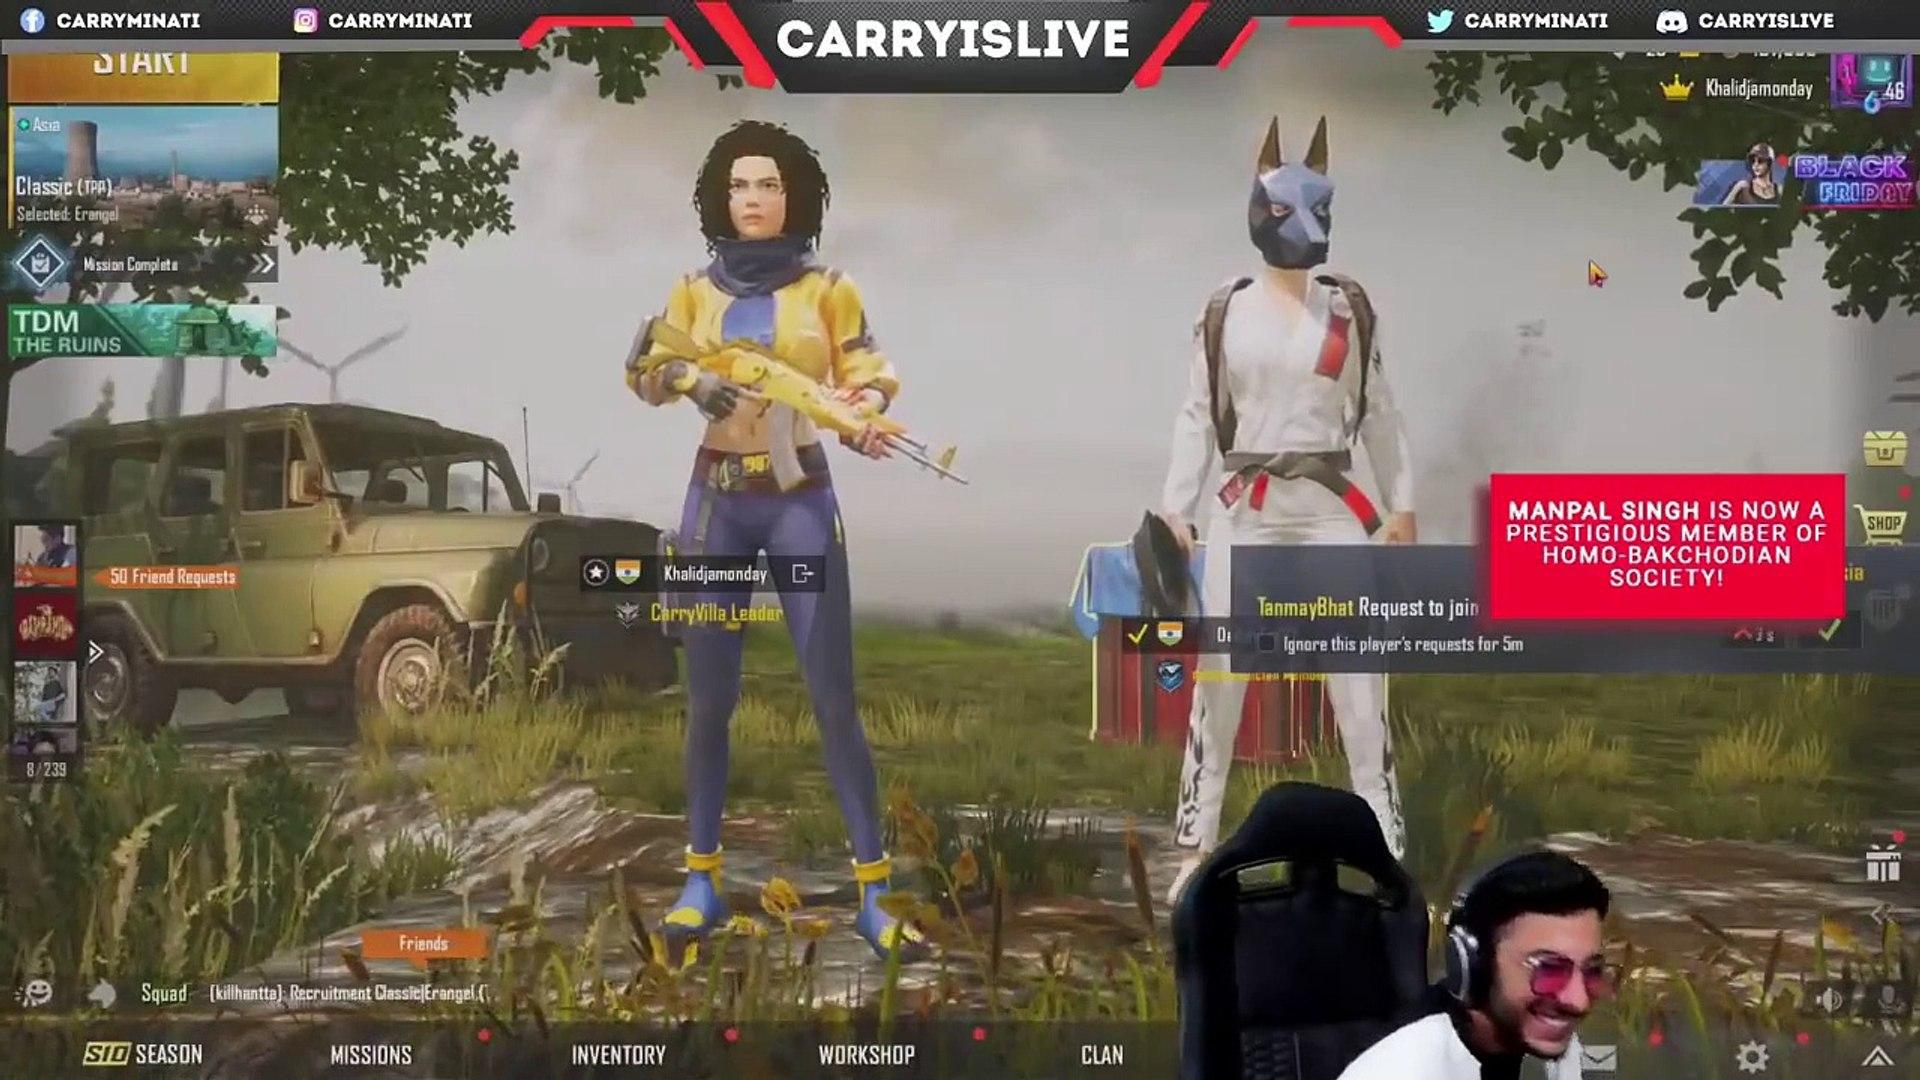 Bakchodi in live stream video by Indian gamer